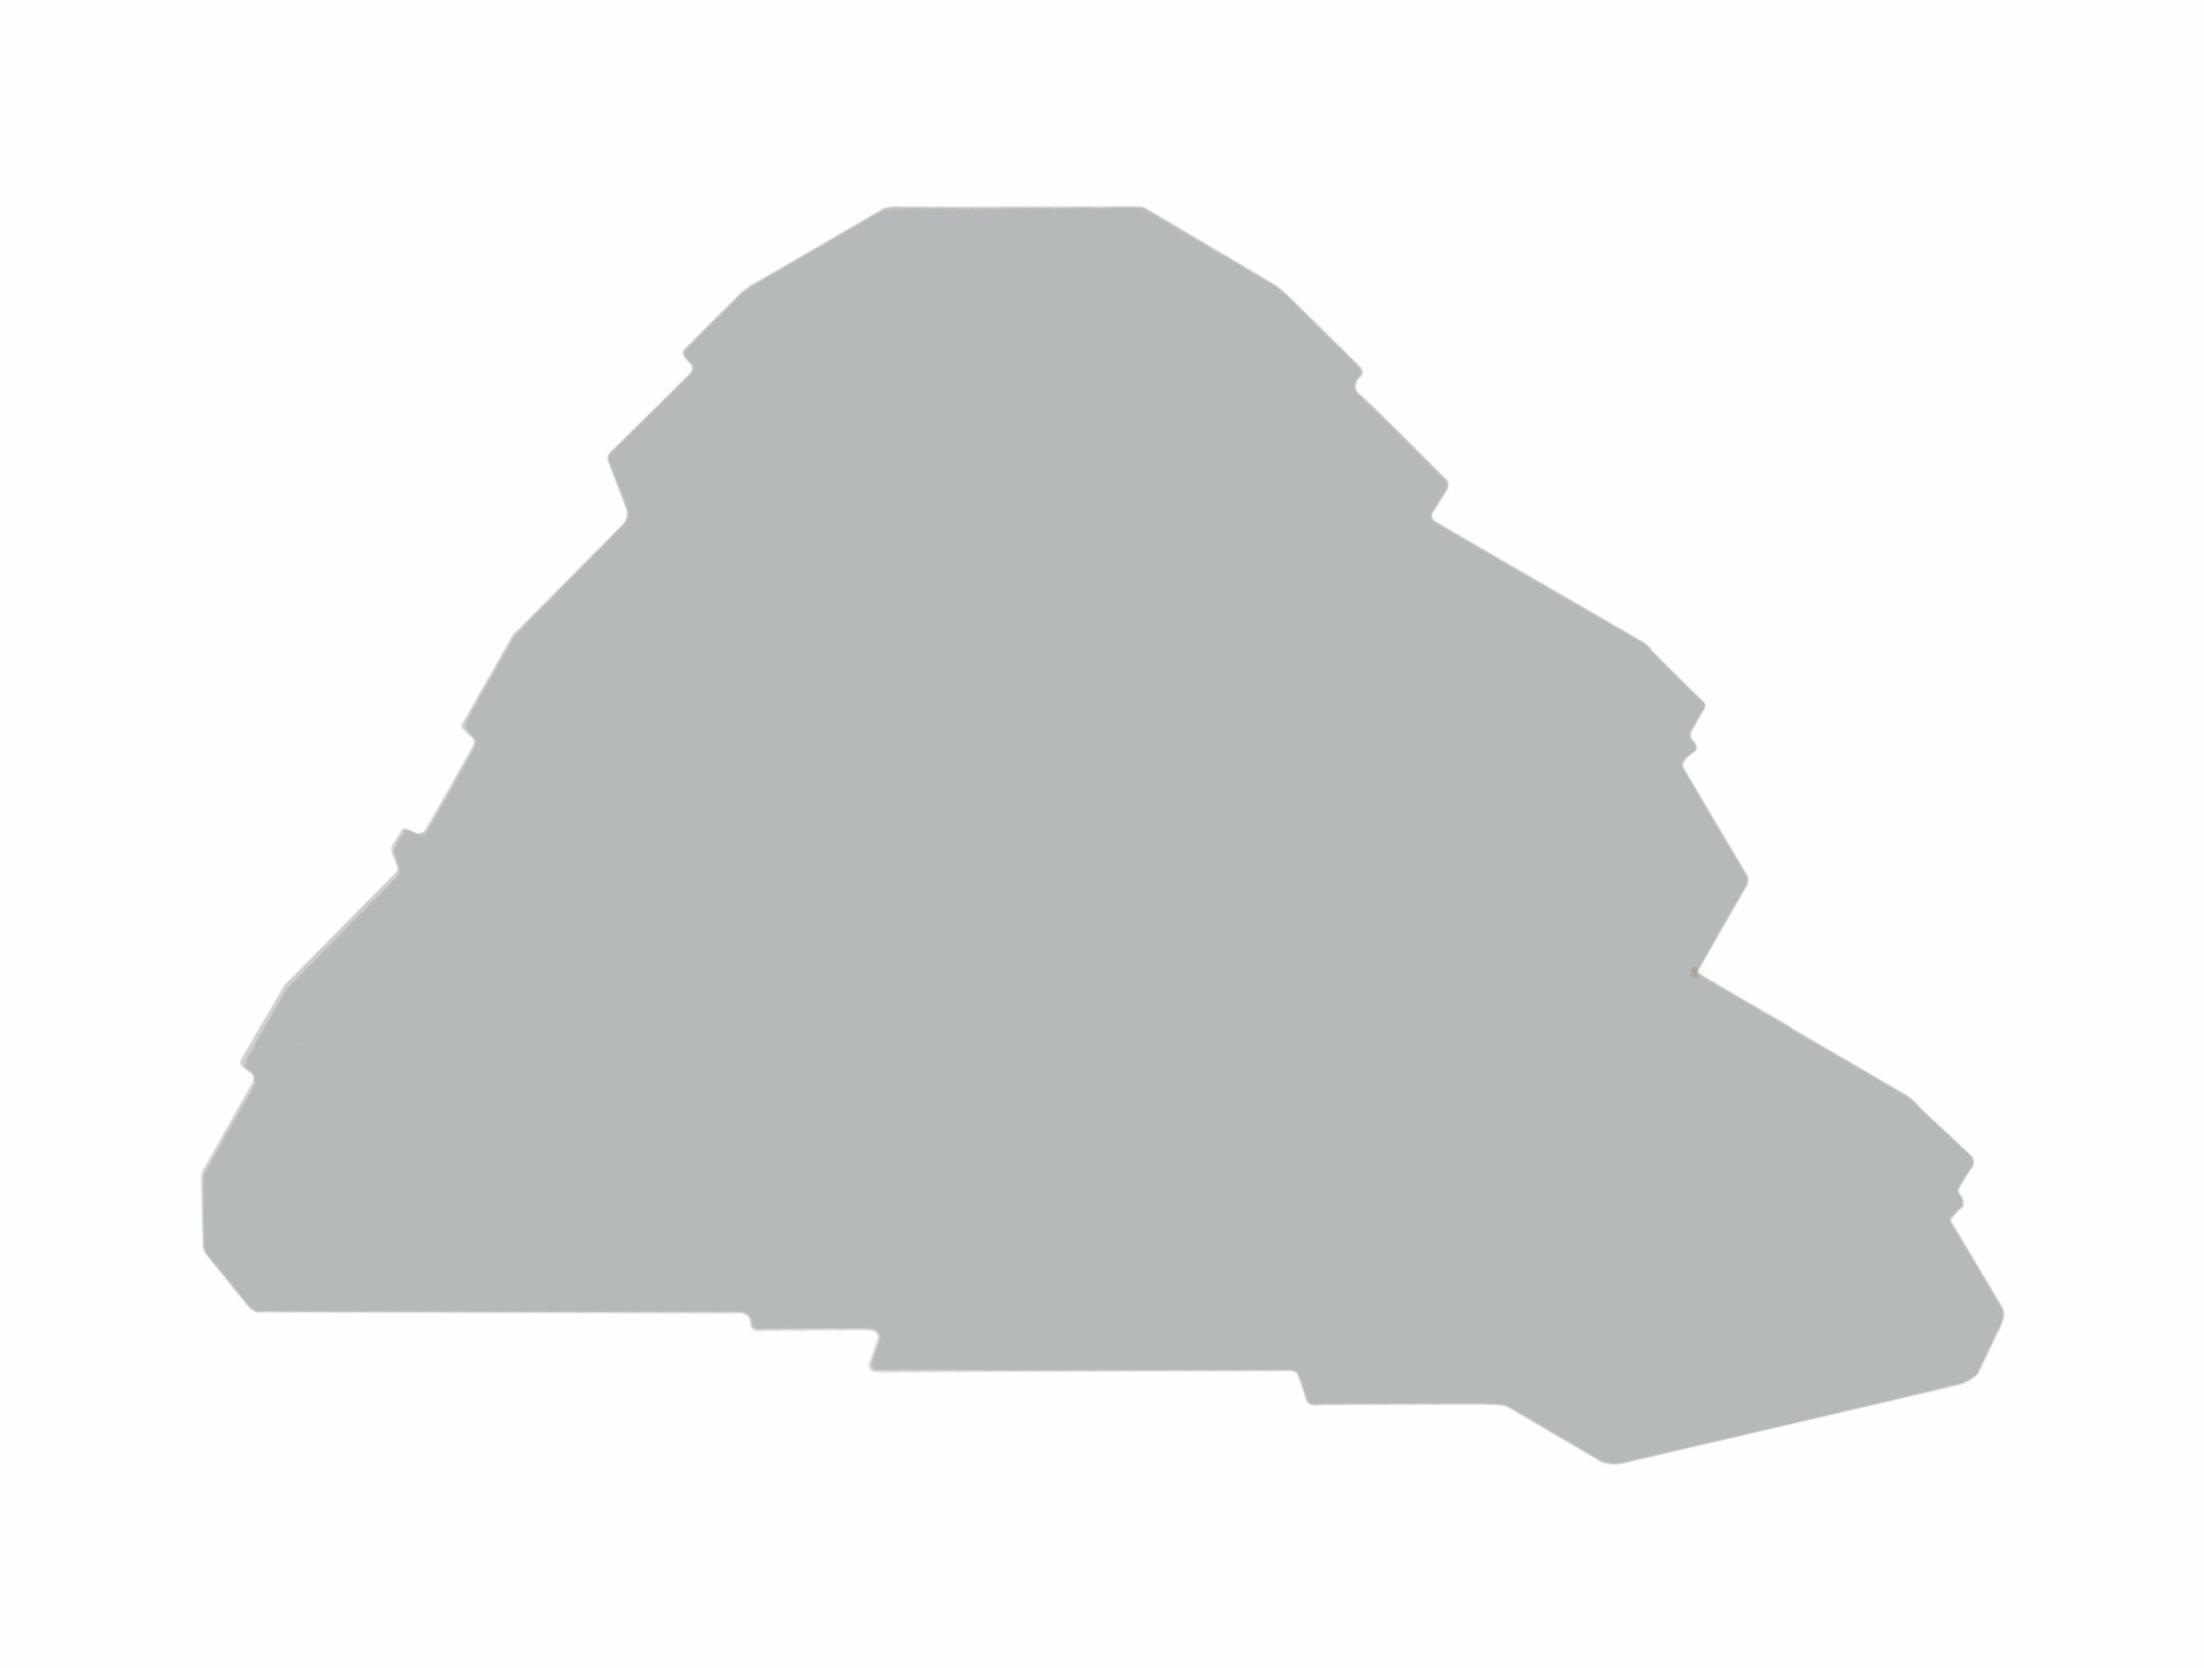 1 Stk Endplatte für Dreistockklemme YBK 2.5 - 3 F grau IK690201--